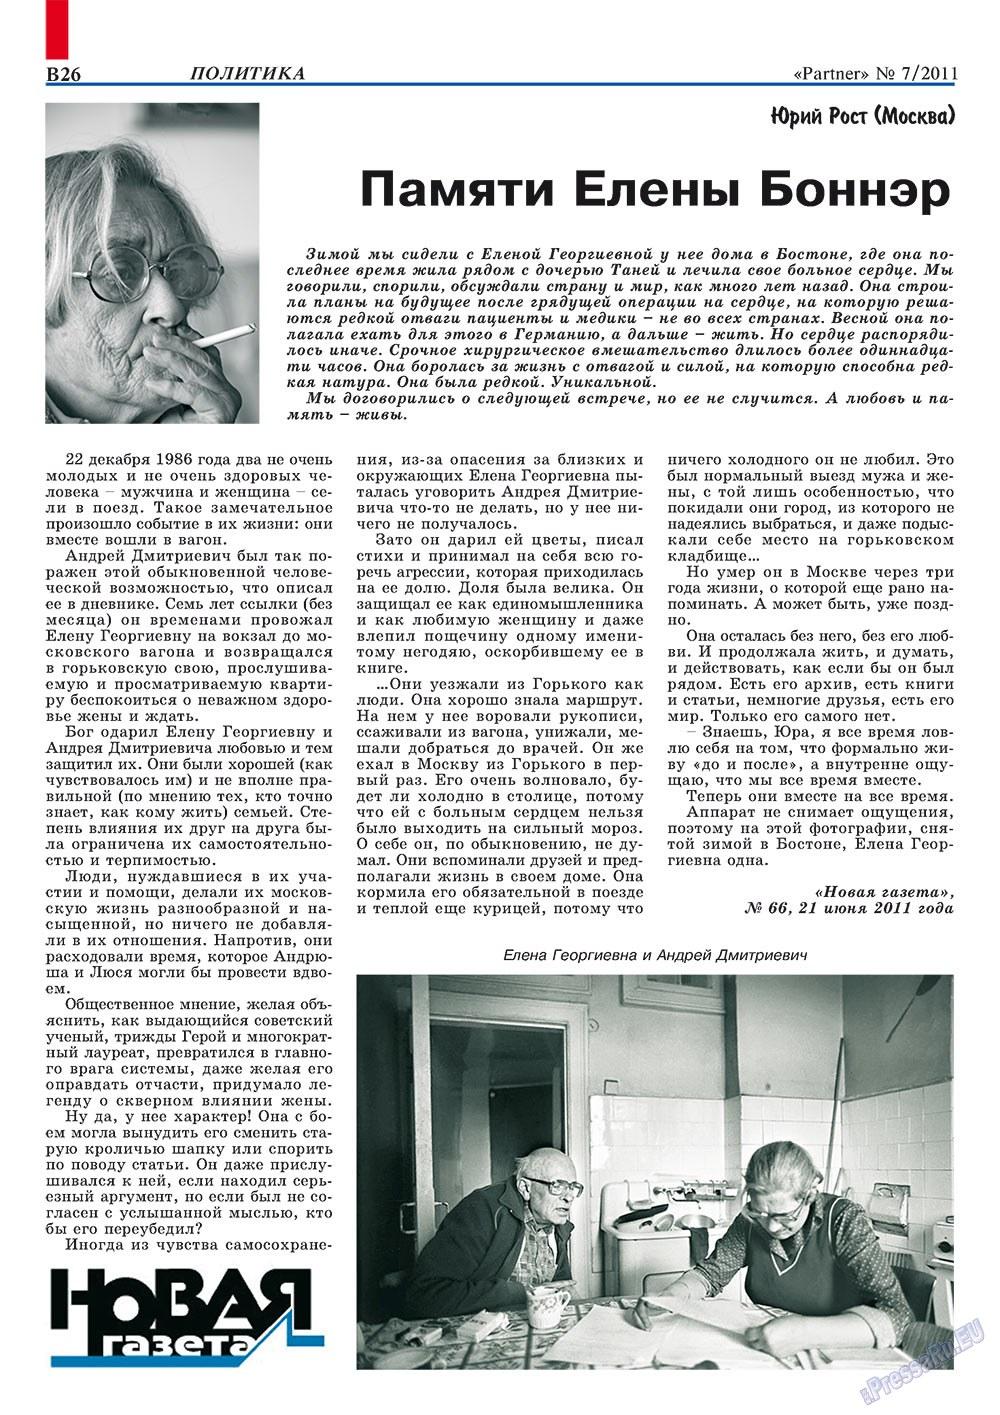 Партнер-север (журнал). 2011 год, номер 7, стр. 36